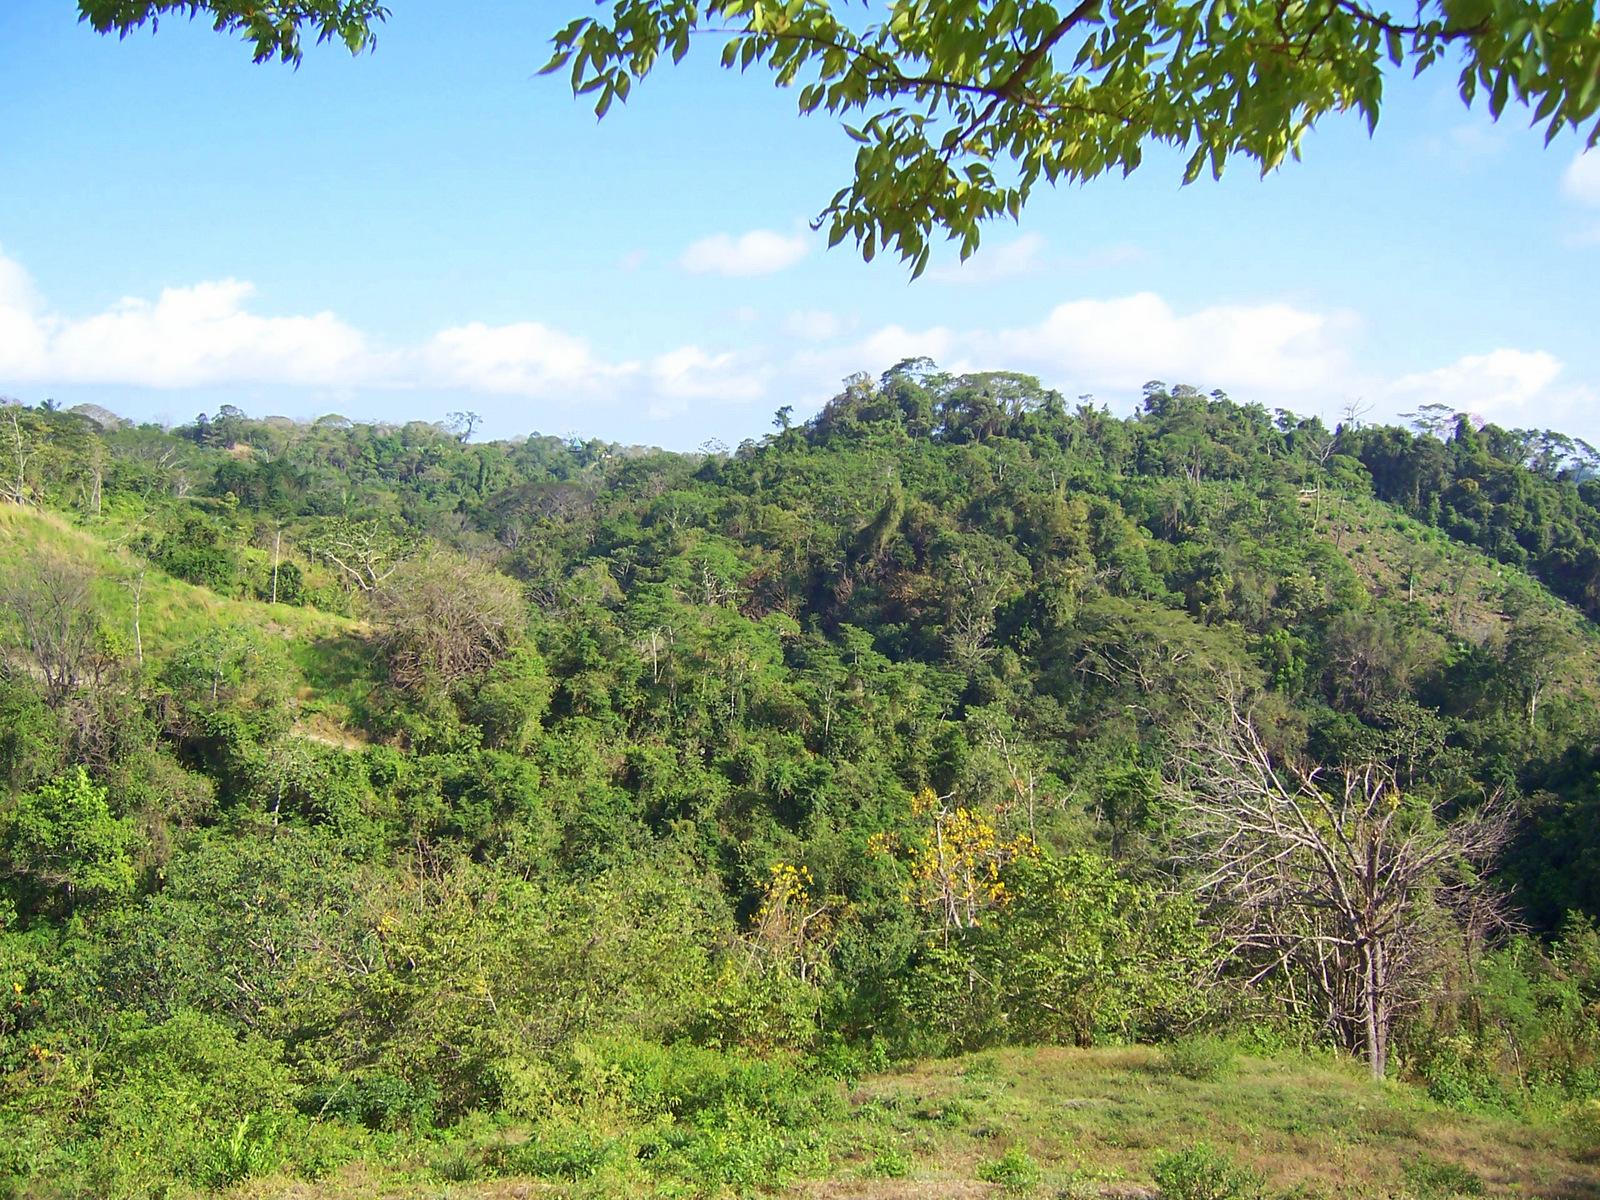 Lote Maravilla Phe 24 Costa Rica Mal Pais Real Estate Agent Properties